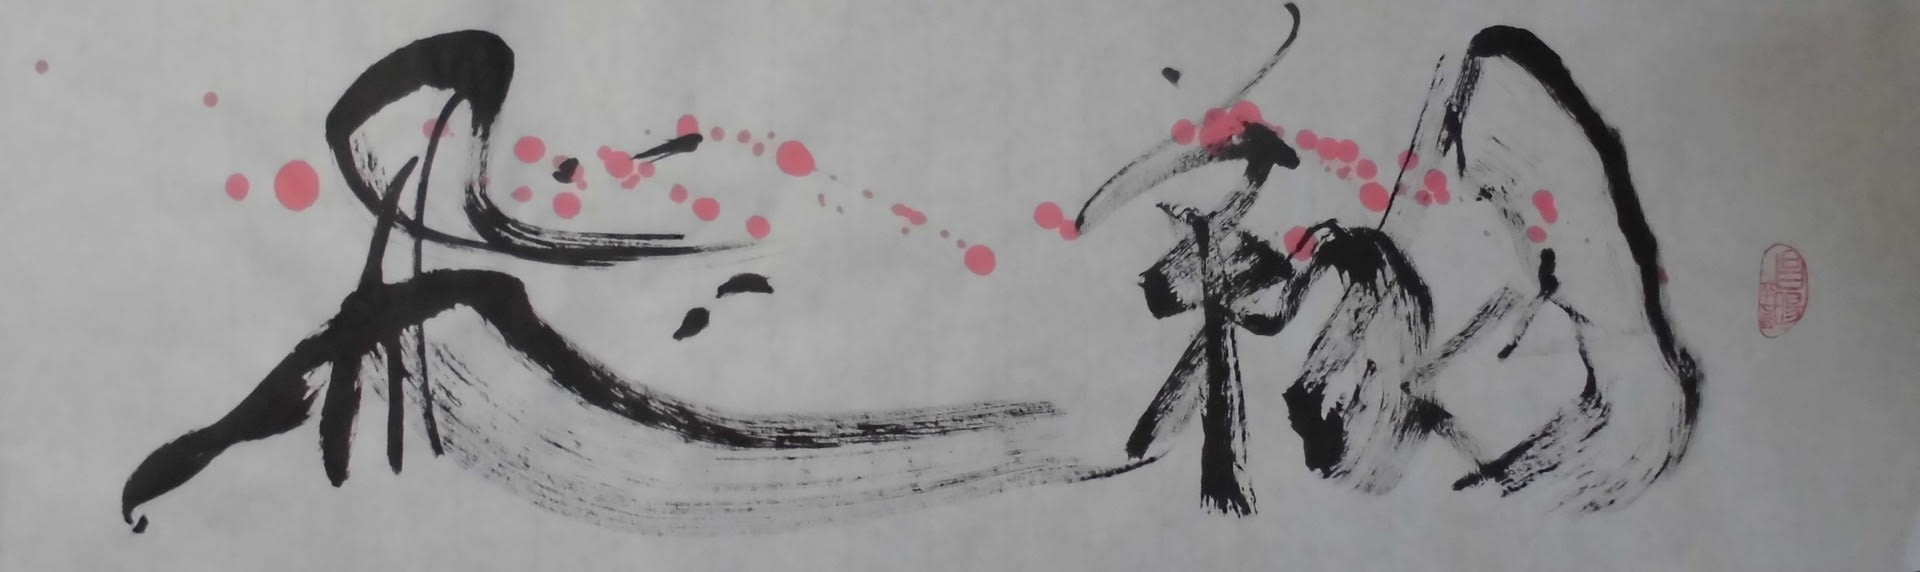 書遊ing 今川昌暘 『書の世界』